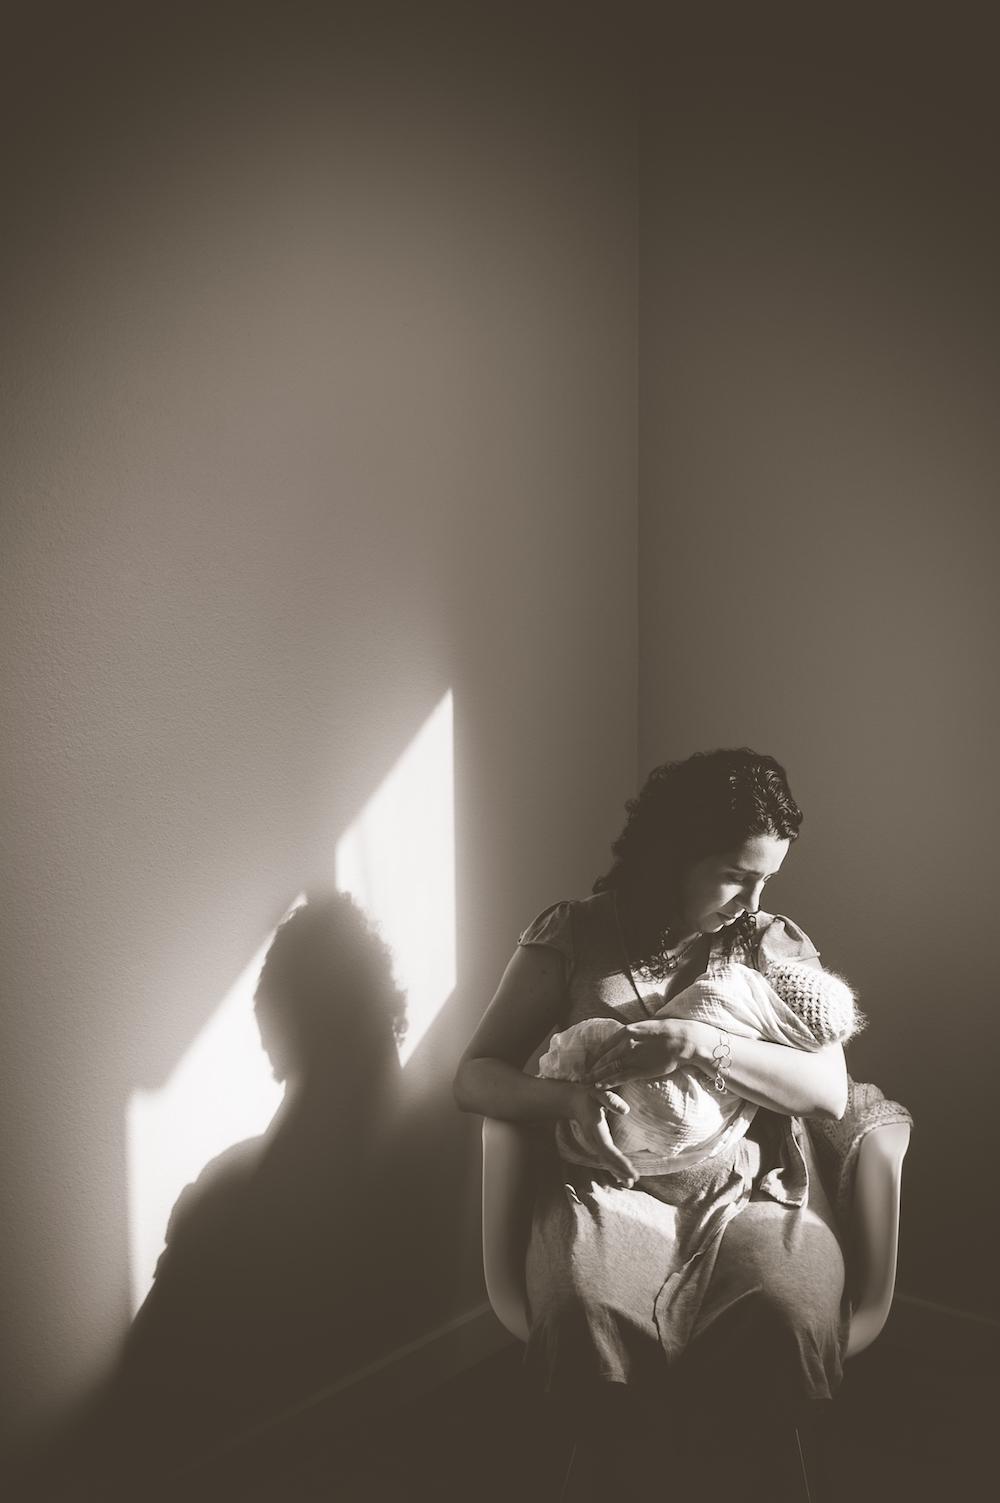 ck-Colorado-Maternity-Baby-Photography-0018.jpg